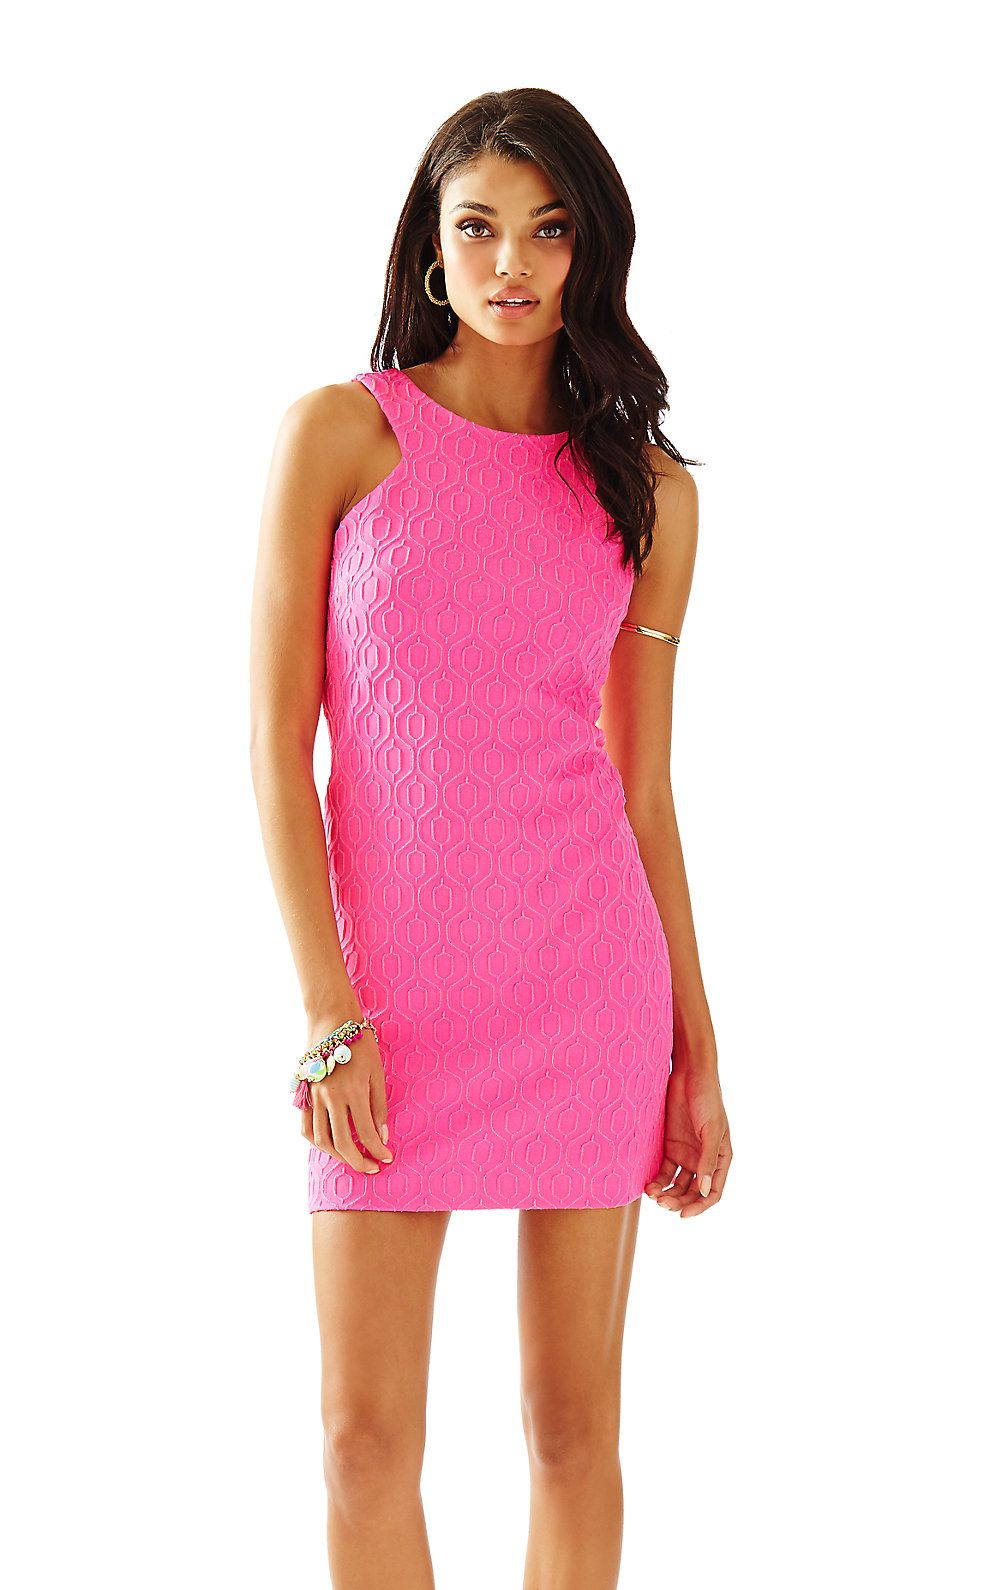 Mango Shift Dress | *Dresses > Party Dresses* | Pinterest